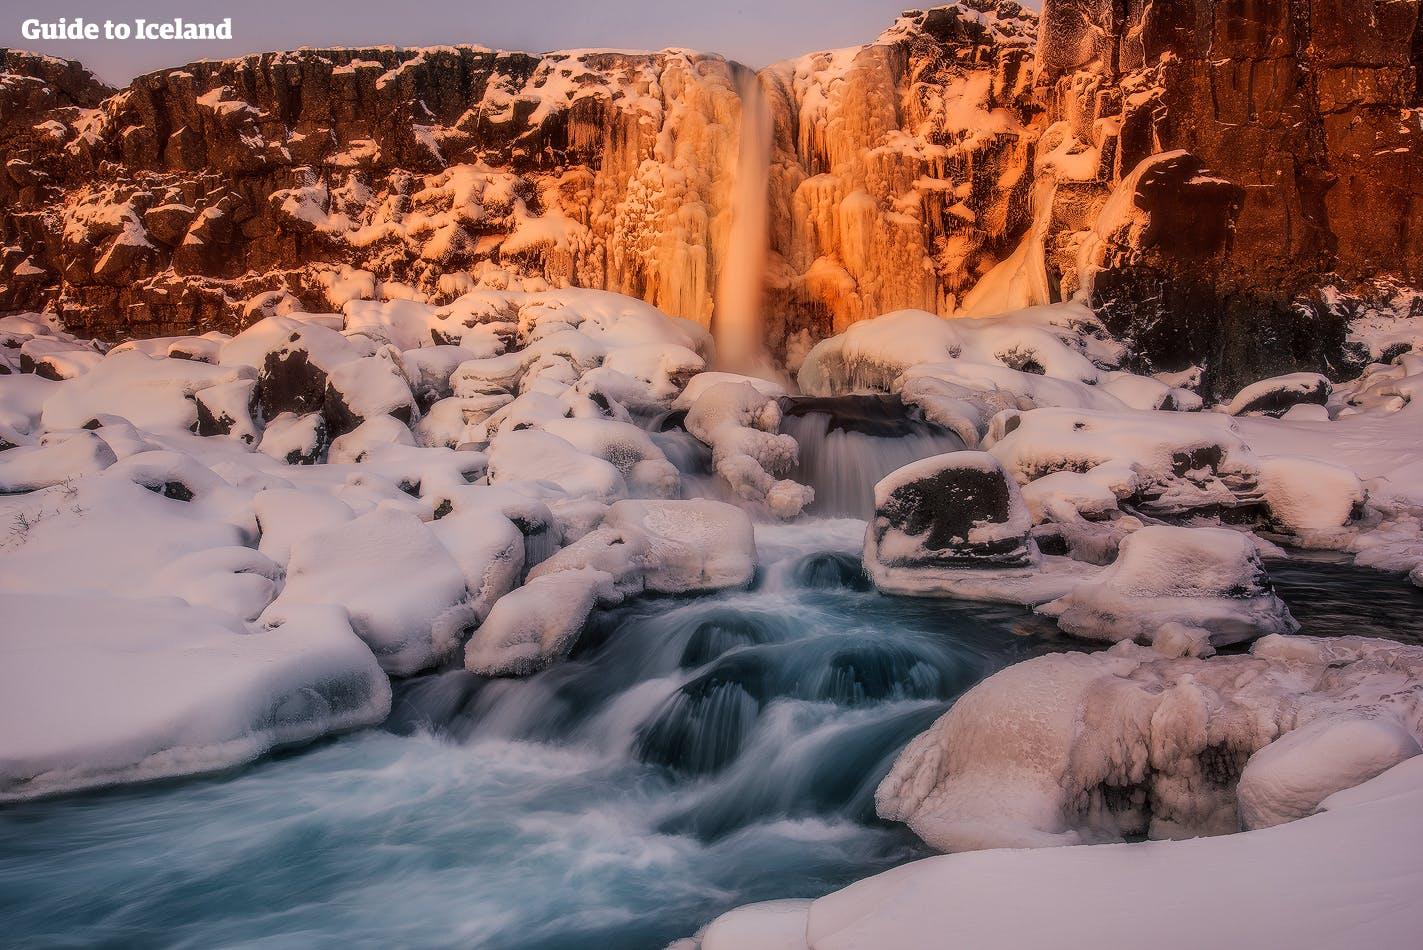 Öxárfoss-vandfaldet er beliggende i Þingvellir Nationalpark på ruten Den Gyldne Cirkel